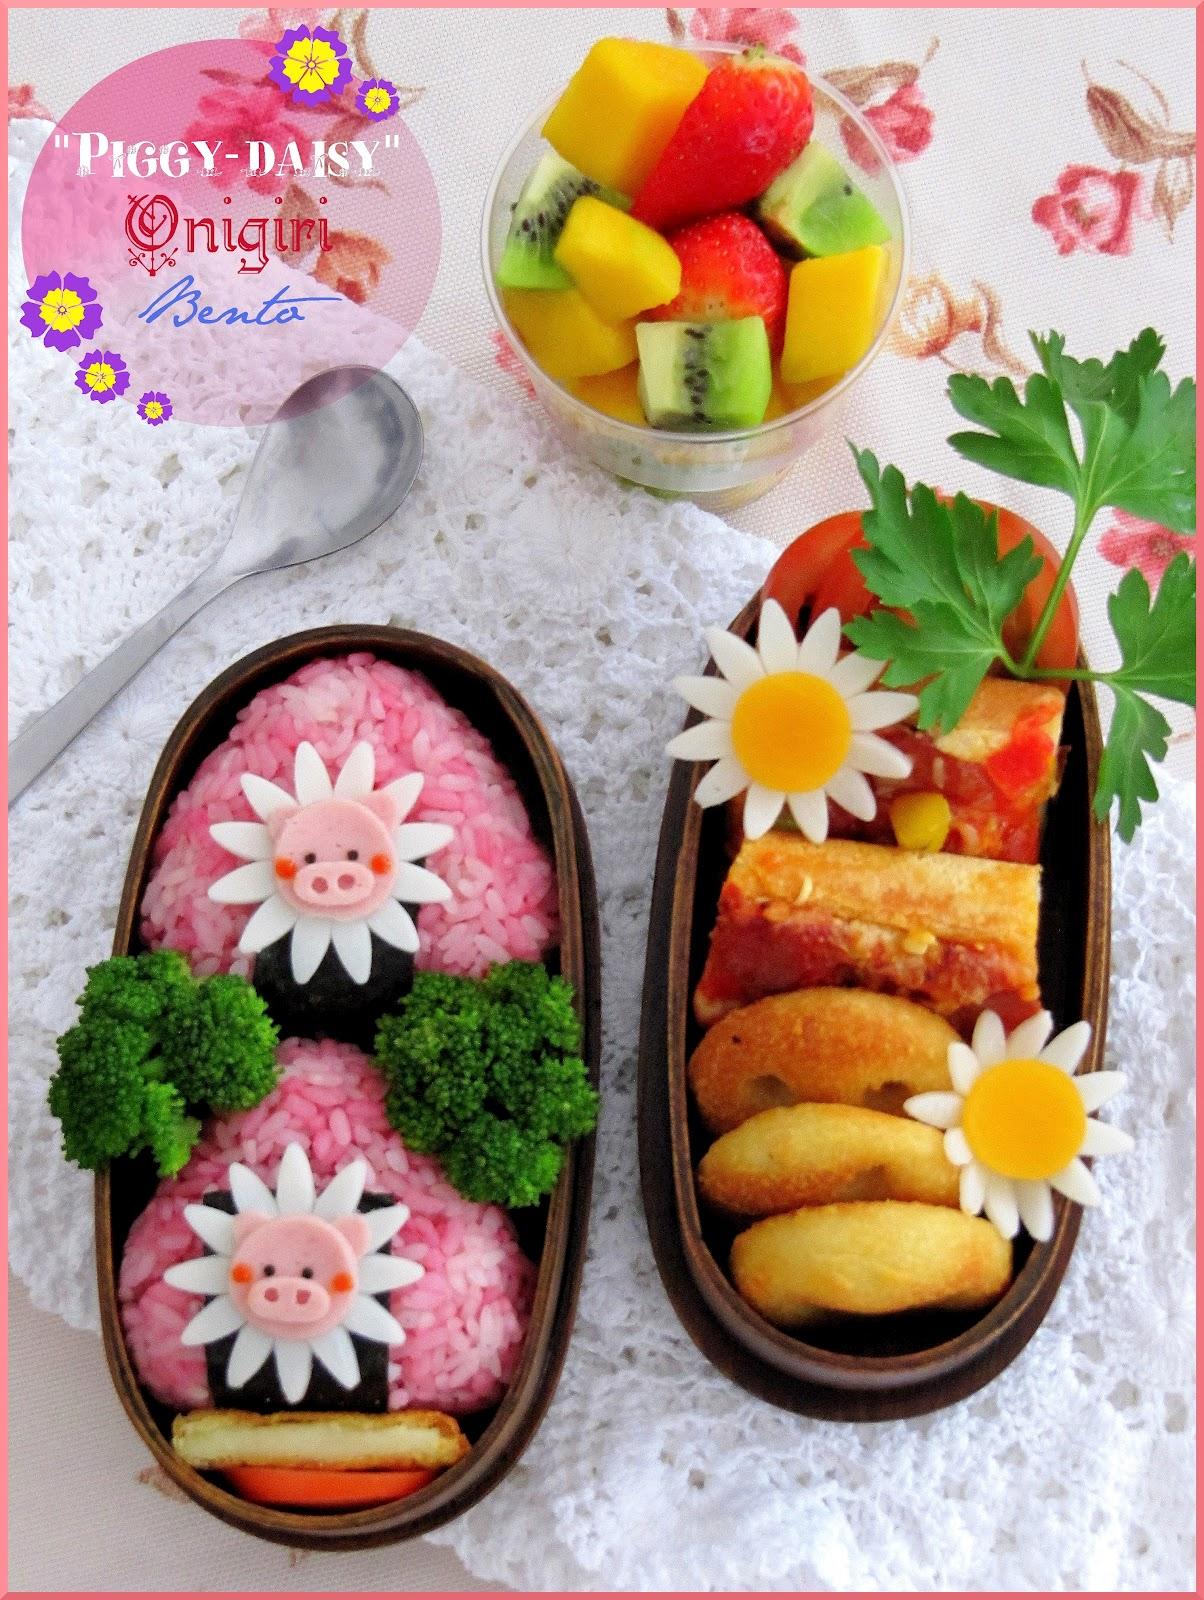 Onigiri Bento Piggy-Daisy Oni...